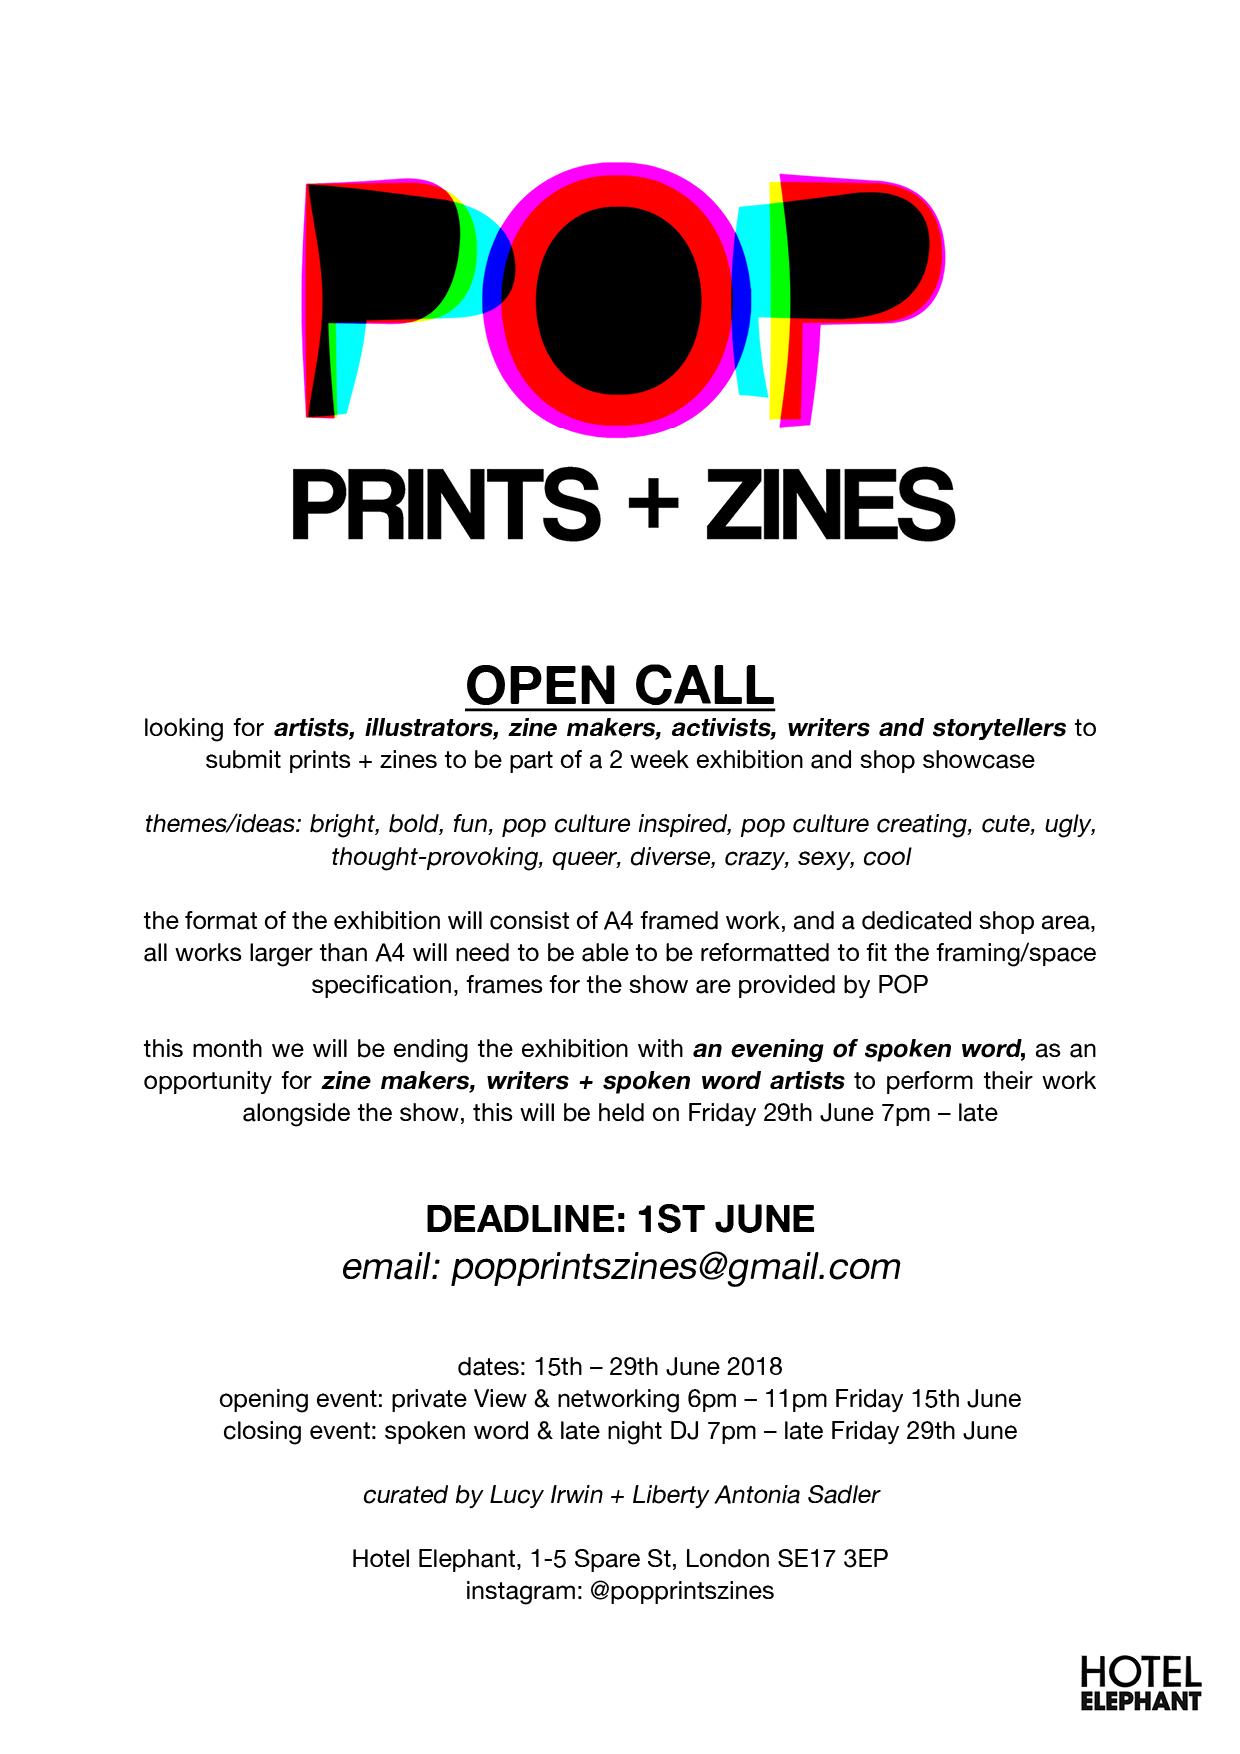 POPprints+zines_June2018.jpg